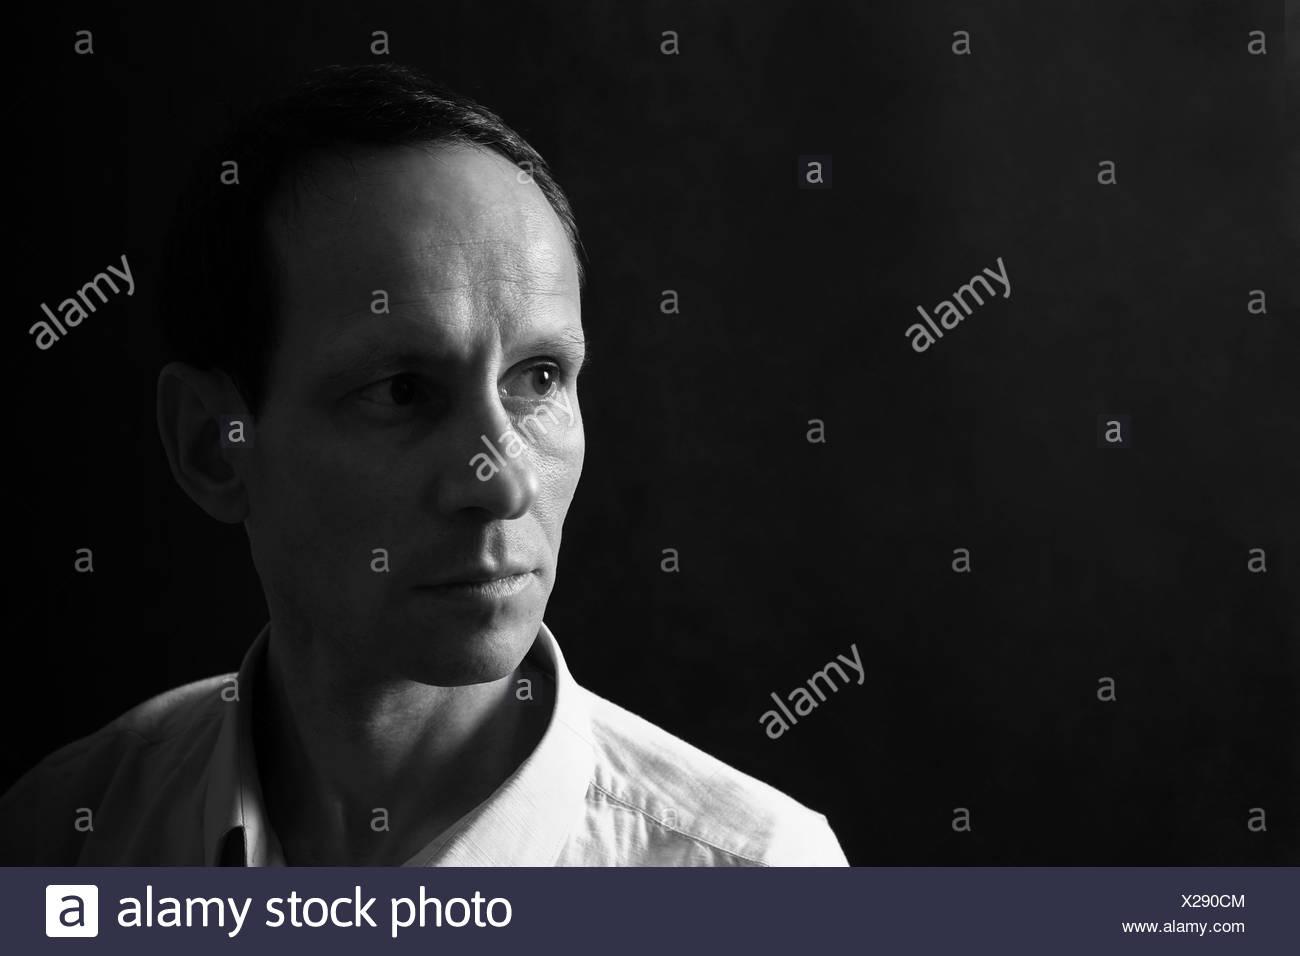 Portrait of the man - Stock Image